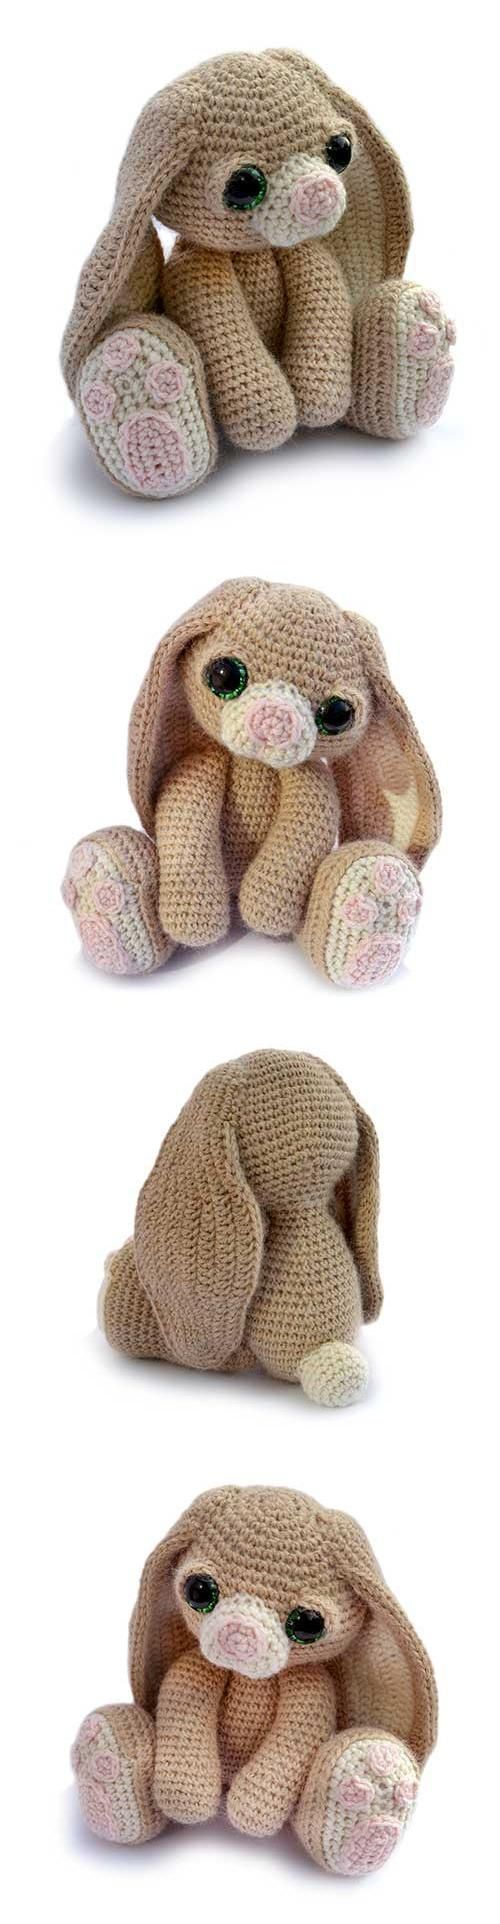 Gorgeous bunny pattern! Found at Amigurumipatterns.net